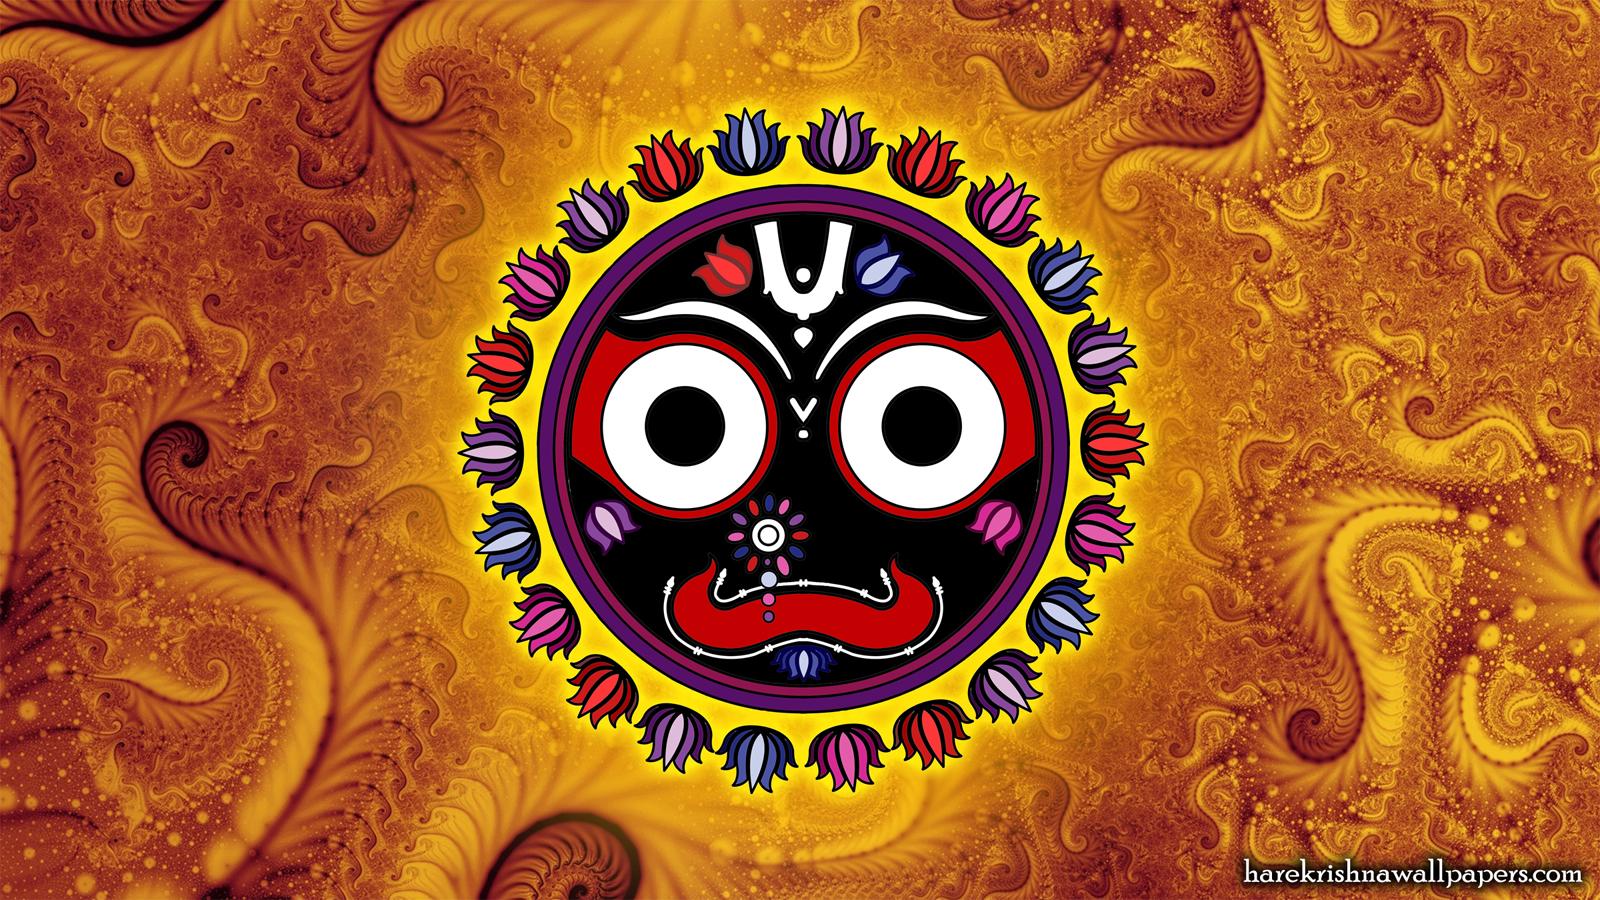 Jai Jagannath Wallpaper (032) Size 1600x900 Download